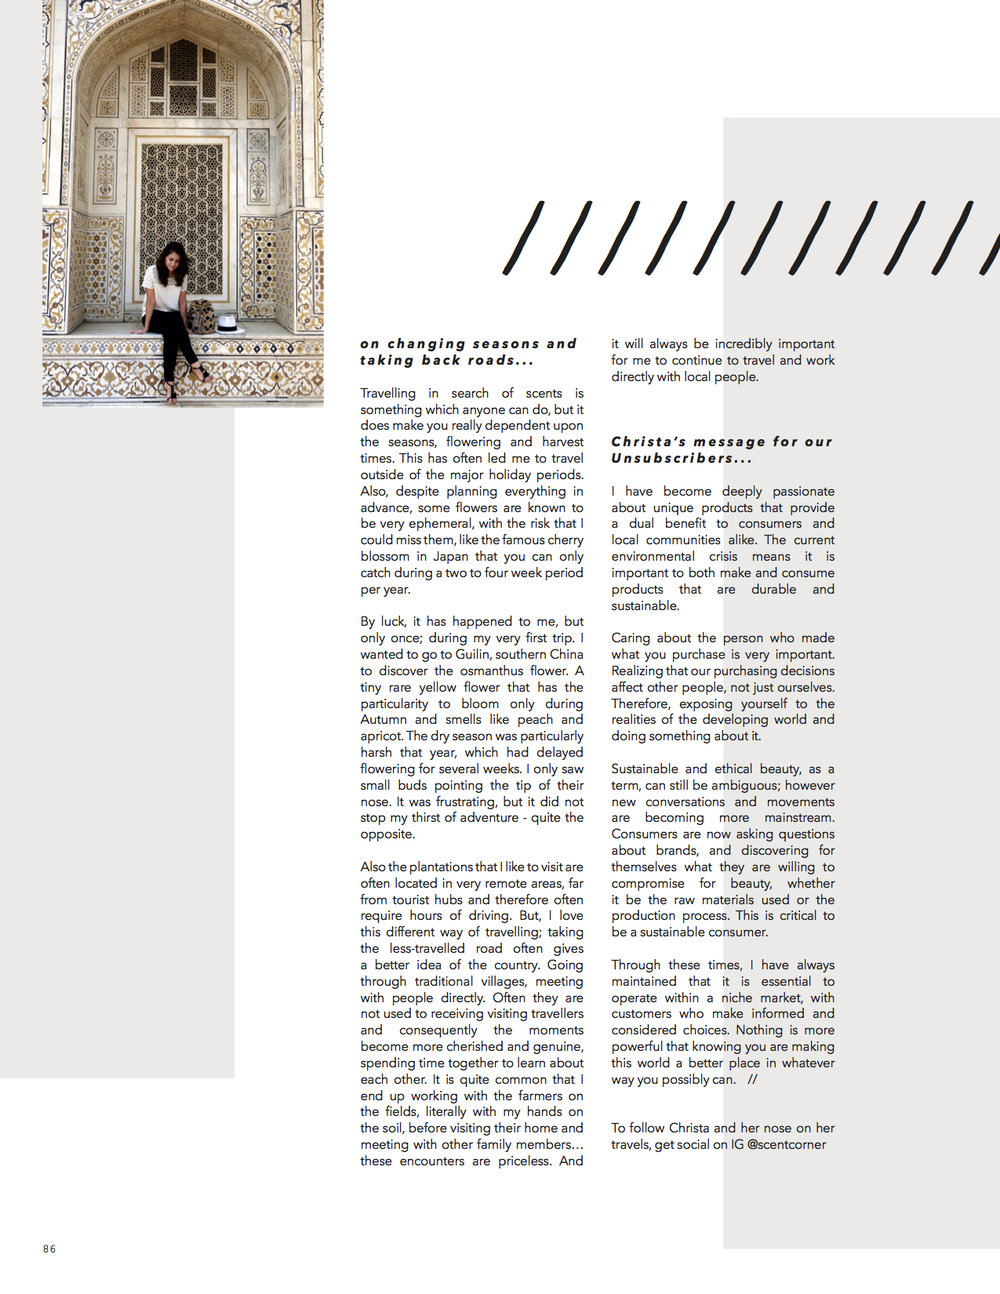 Unsubscribed Magazine 5.jpg